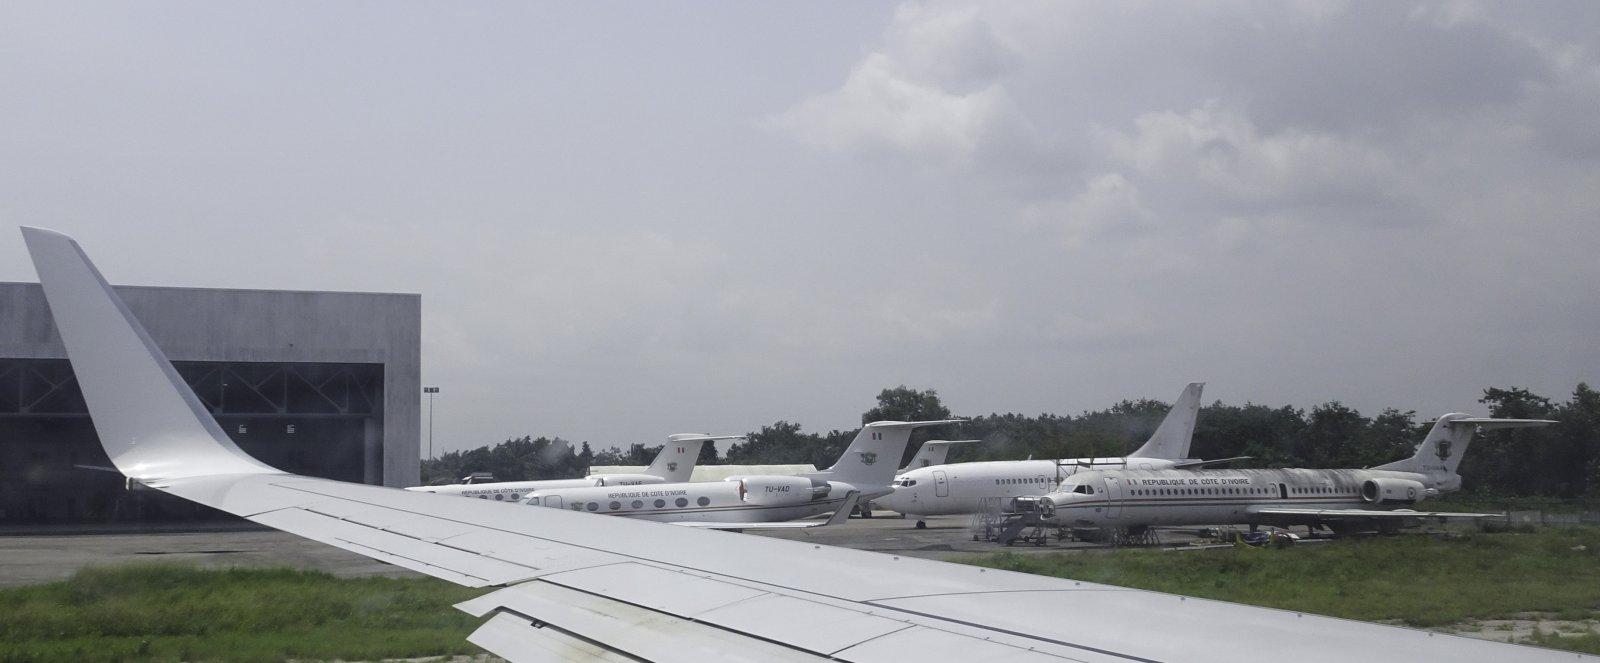 Norsunluunrannikko - Abidjan Félix-Houphouët-Boigny International Airport (ABJ)